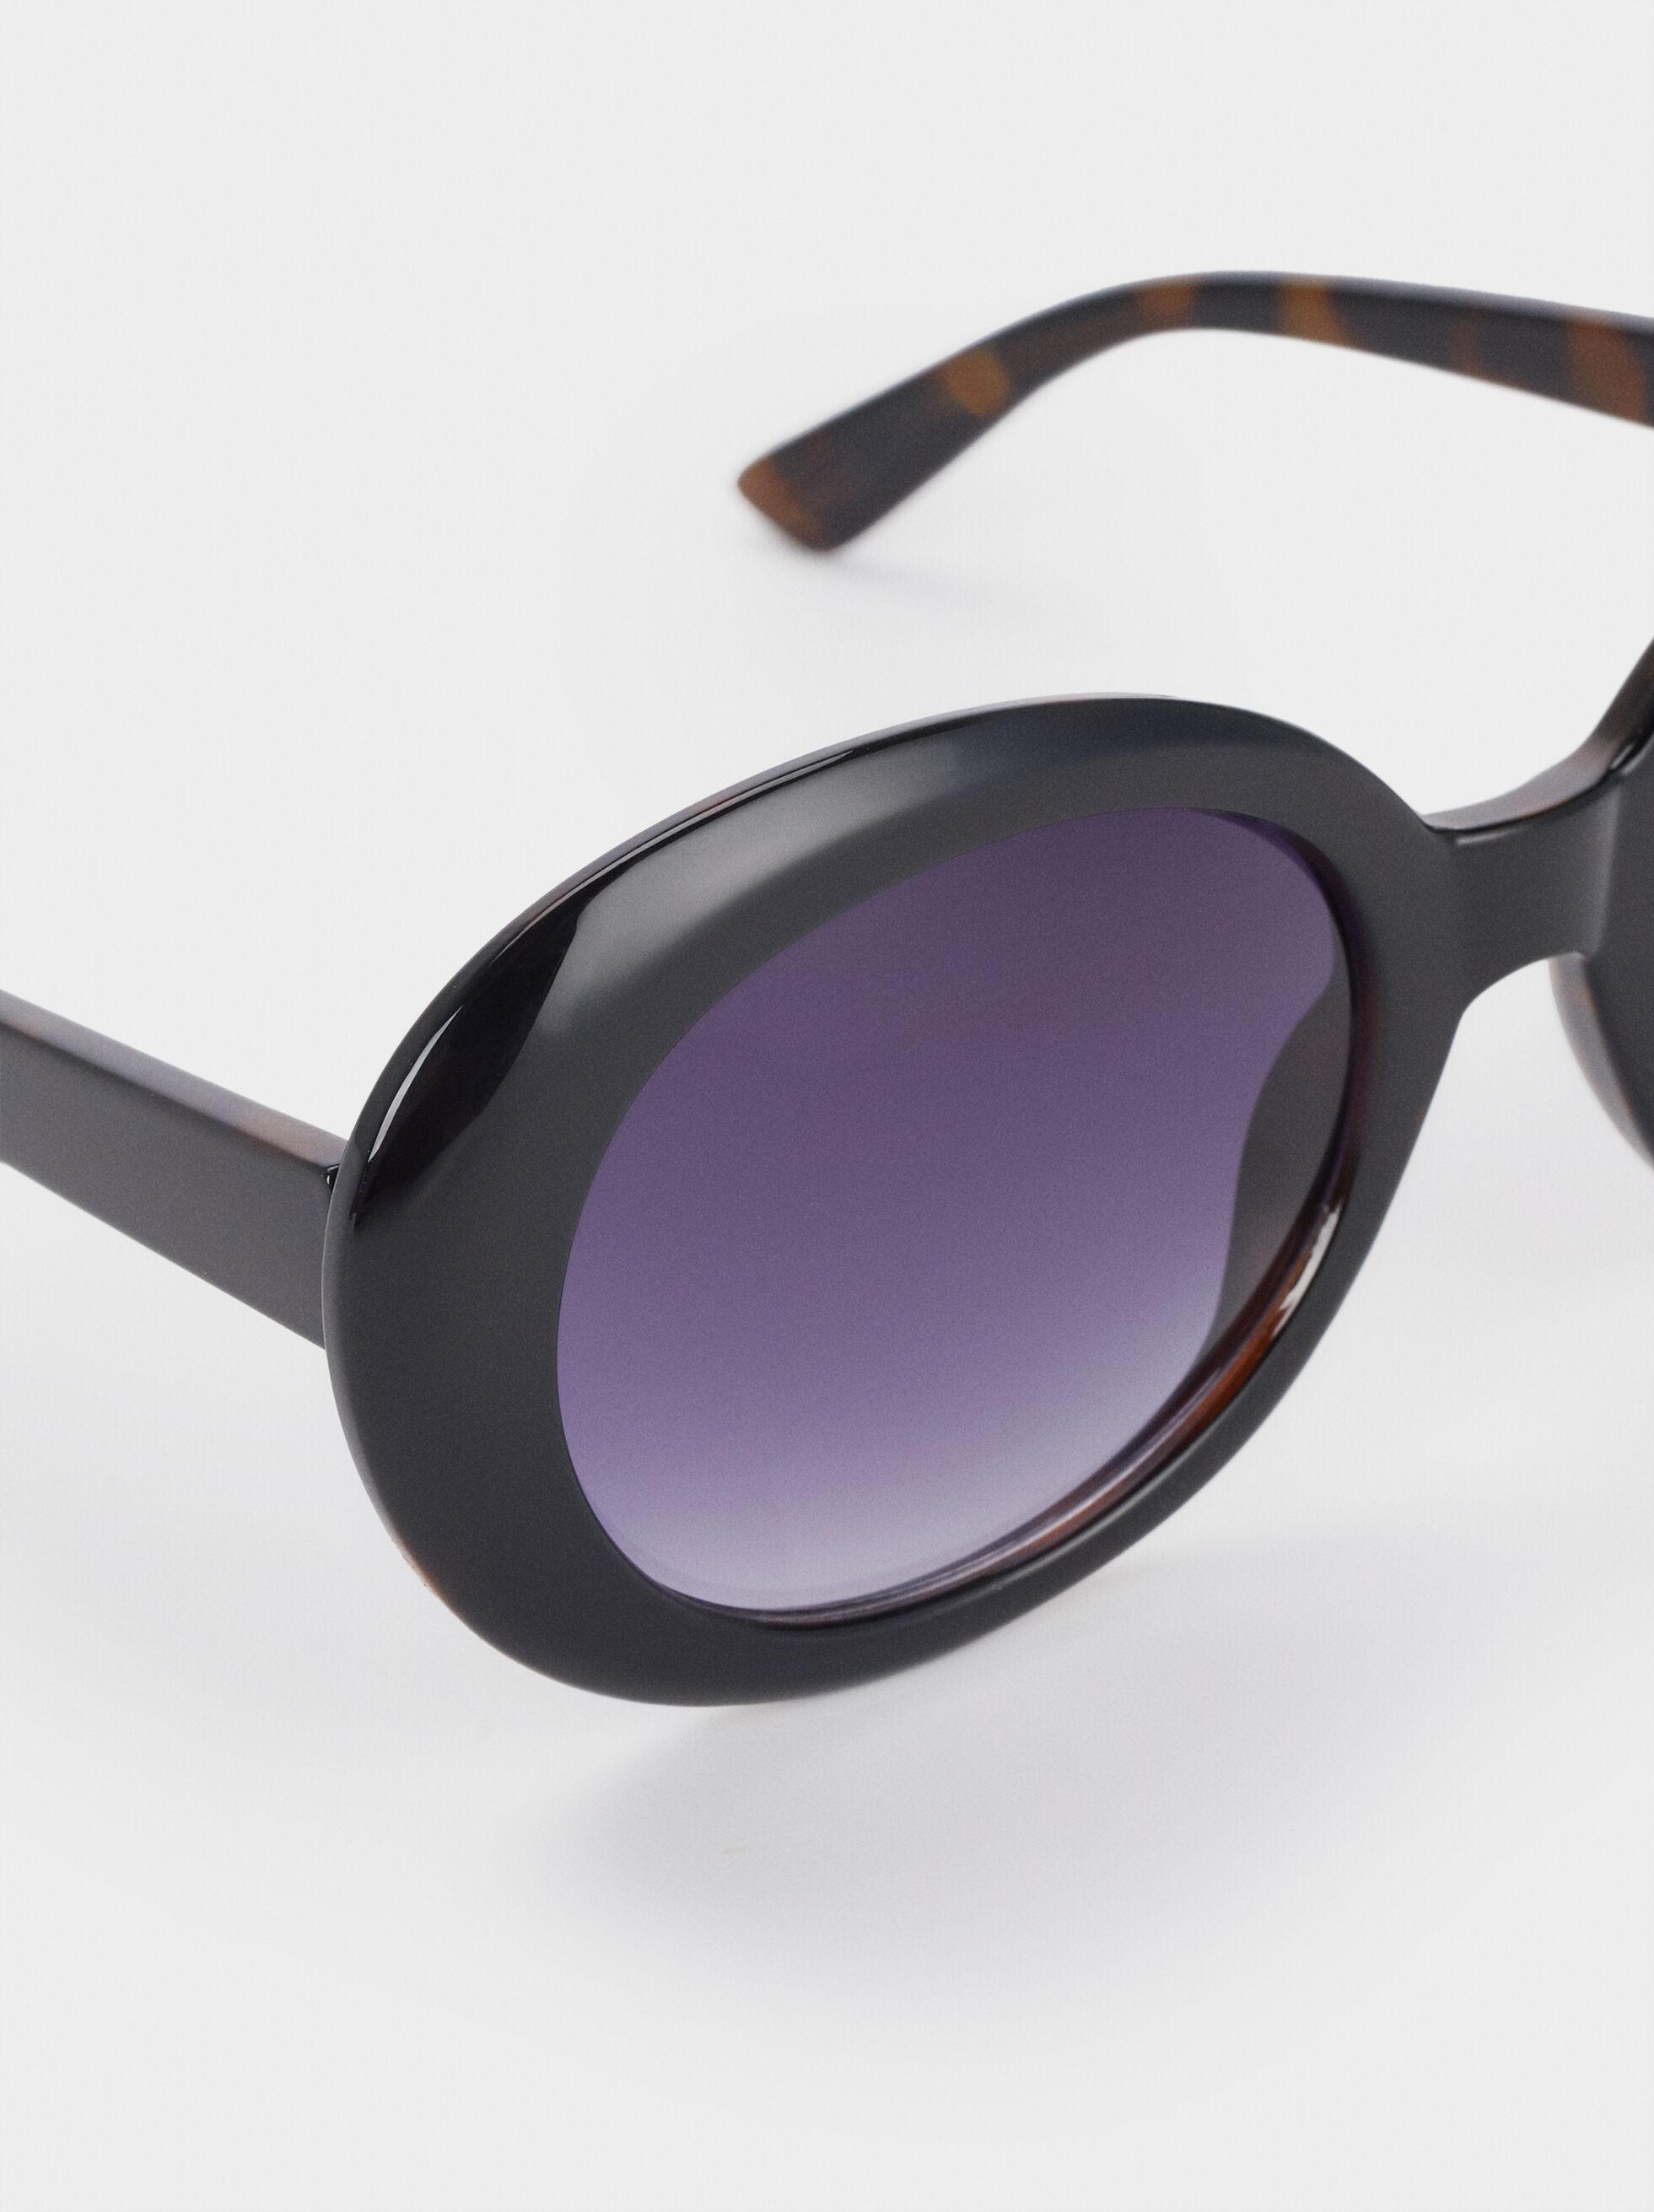 Oval Resin Sunglasses, Black, hi-res